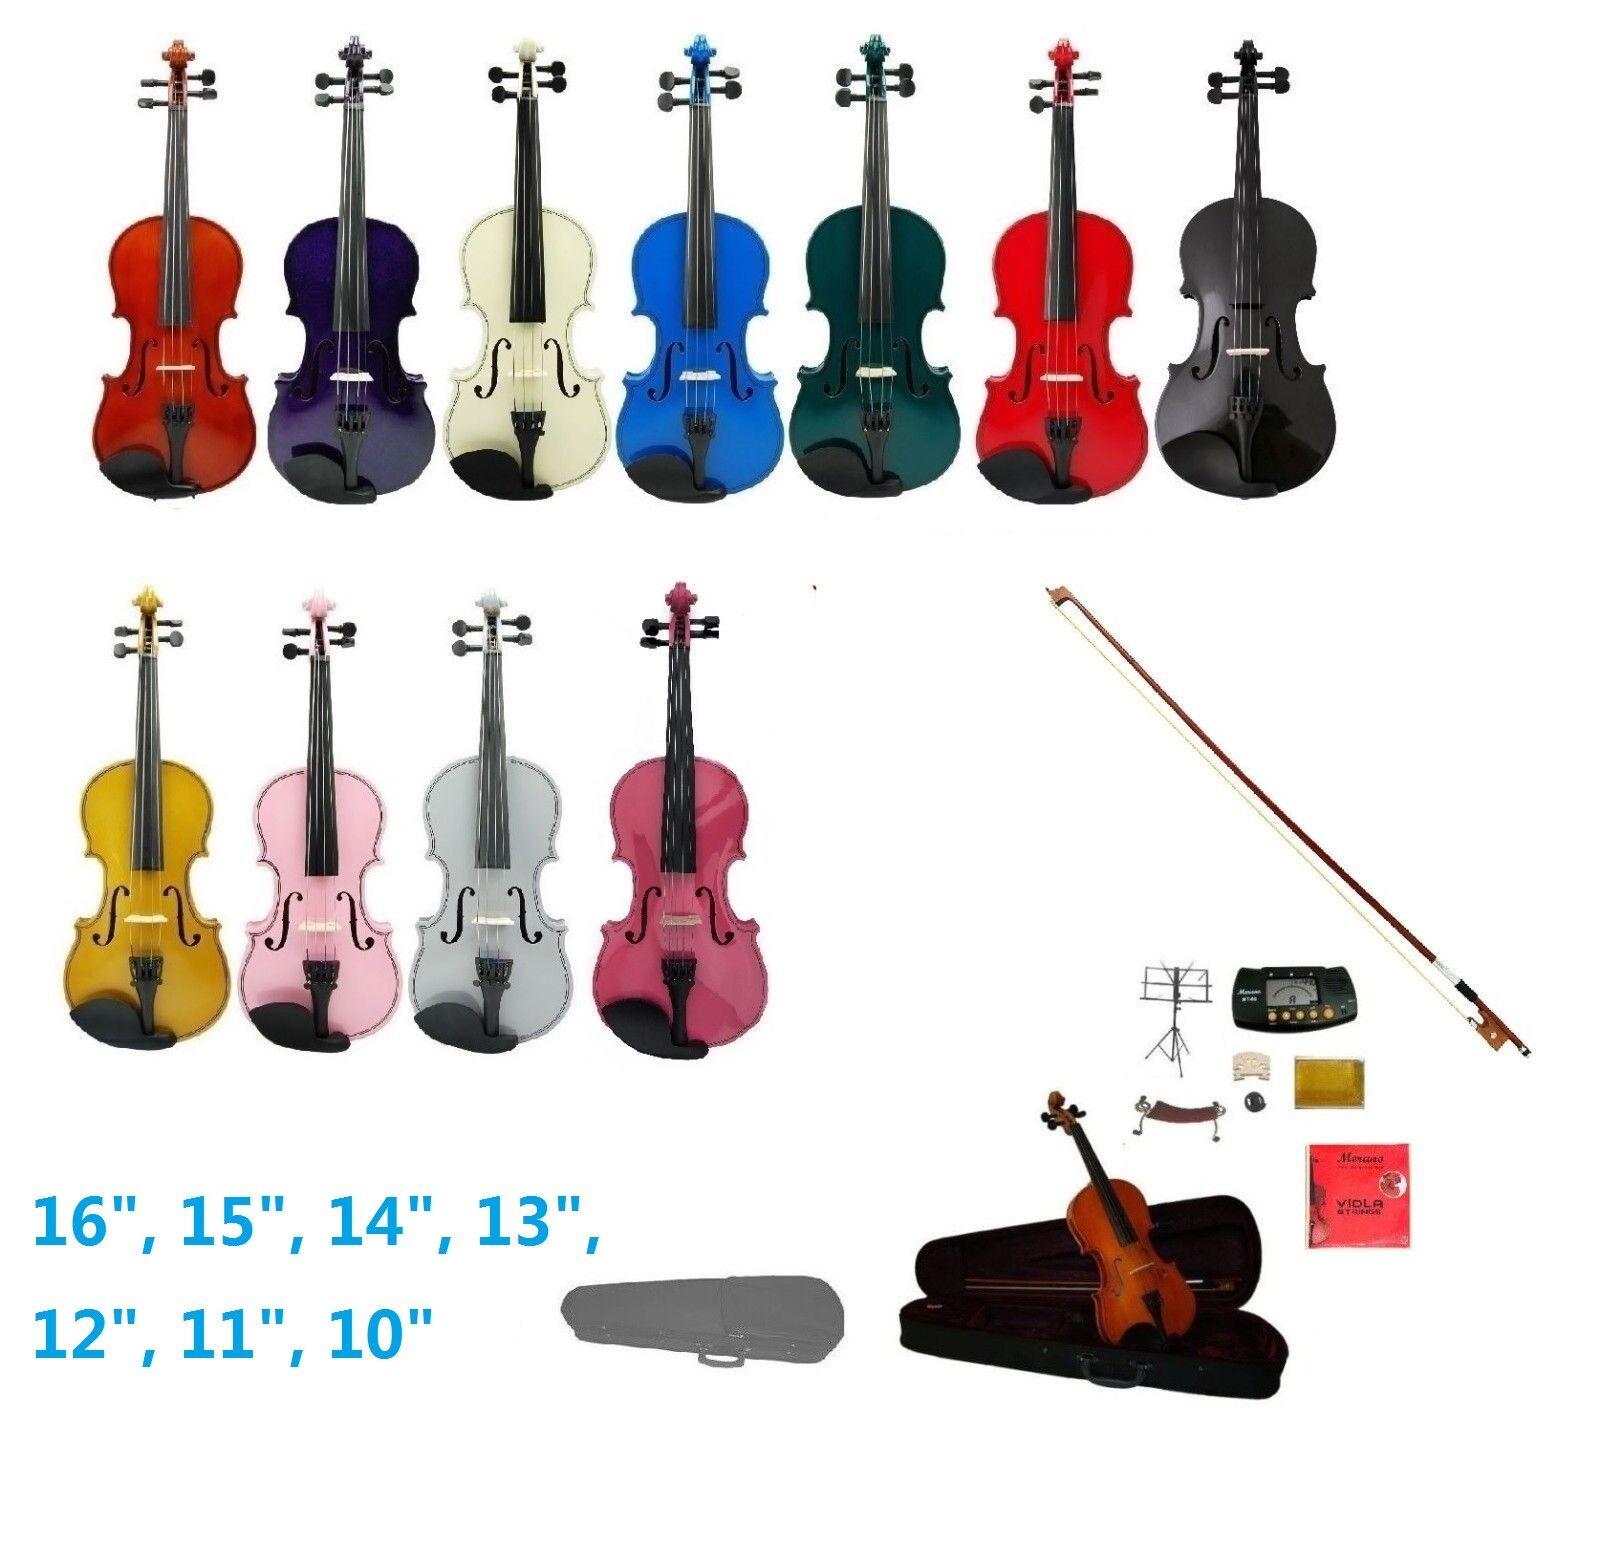 New purple,Case,Bow+Rosin,Tuner,Stand,Shoulder Rest,Mute16 15 14 13 12 11 10